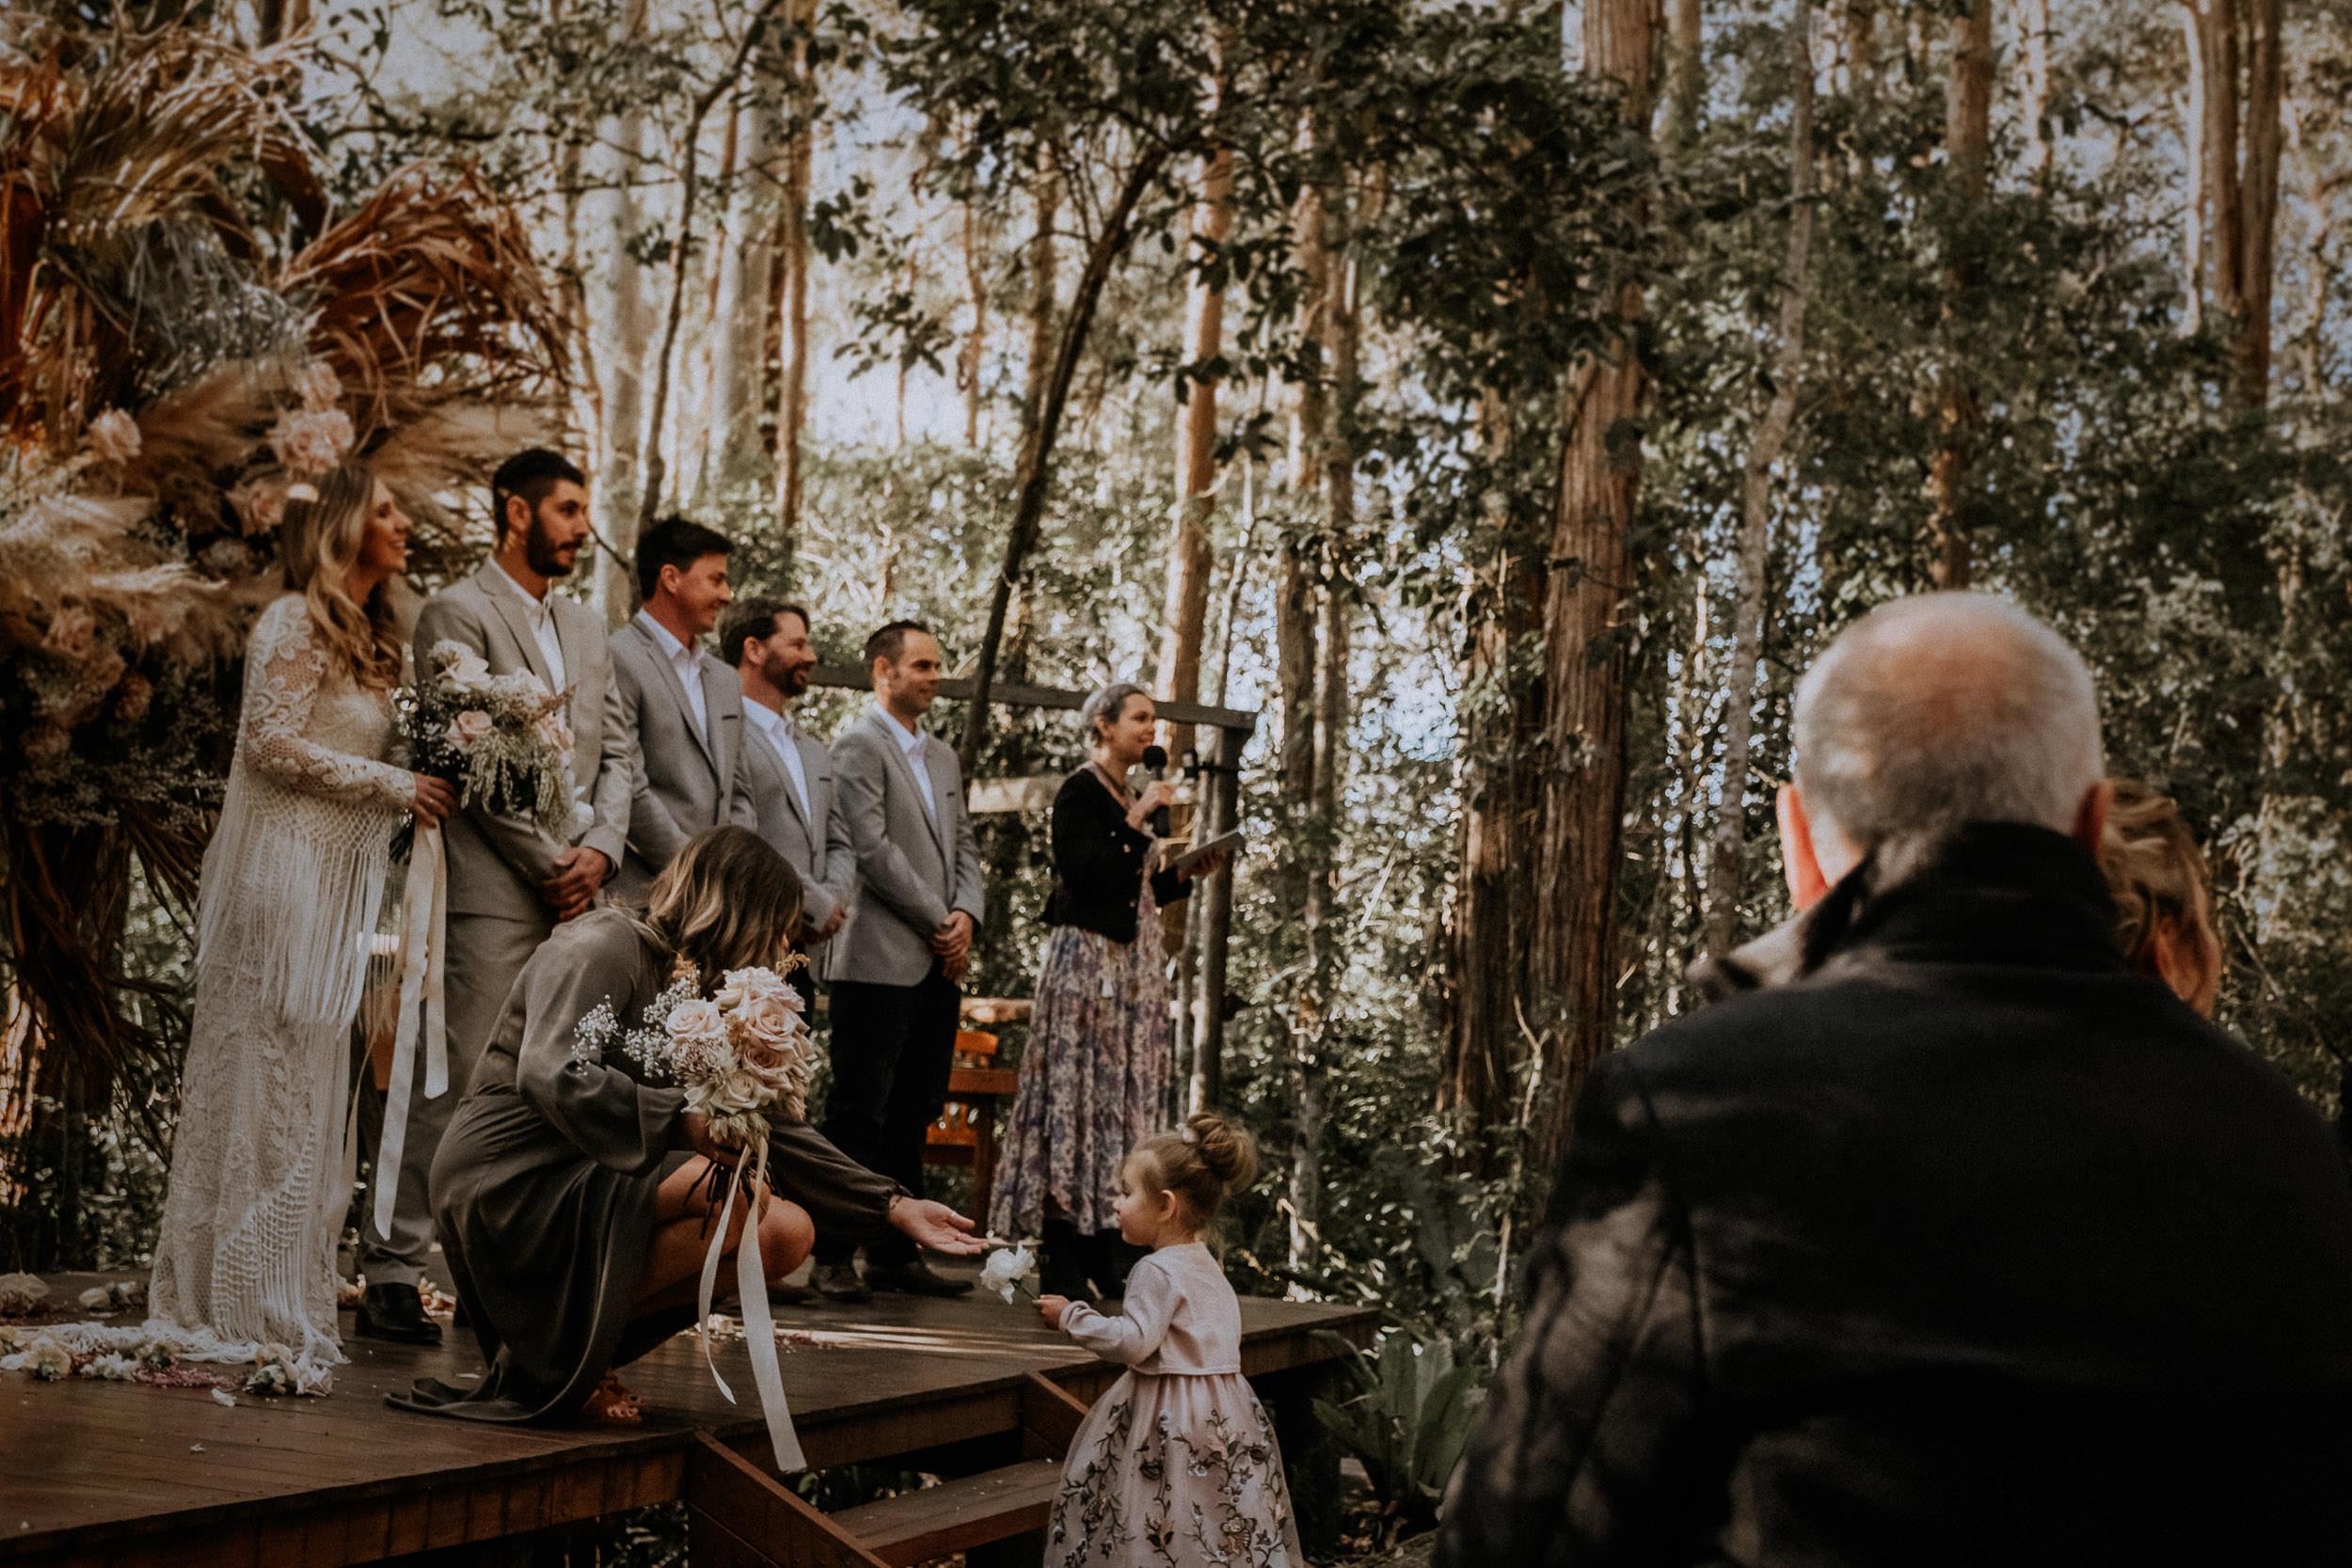 S&A Elopement - Kings & Thieves - Shred 'Til Dead - Central Coast Beach Forest Wedding - 187.jpg